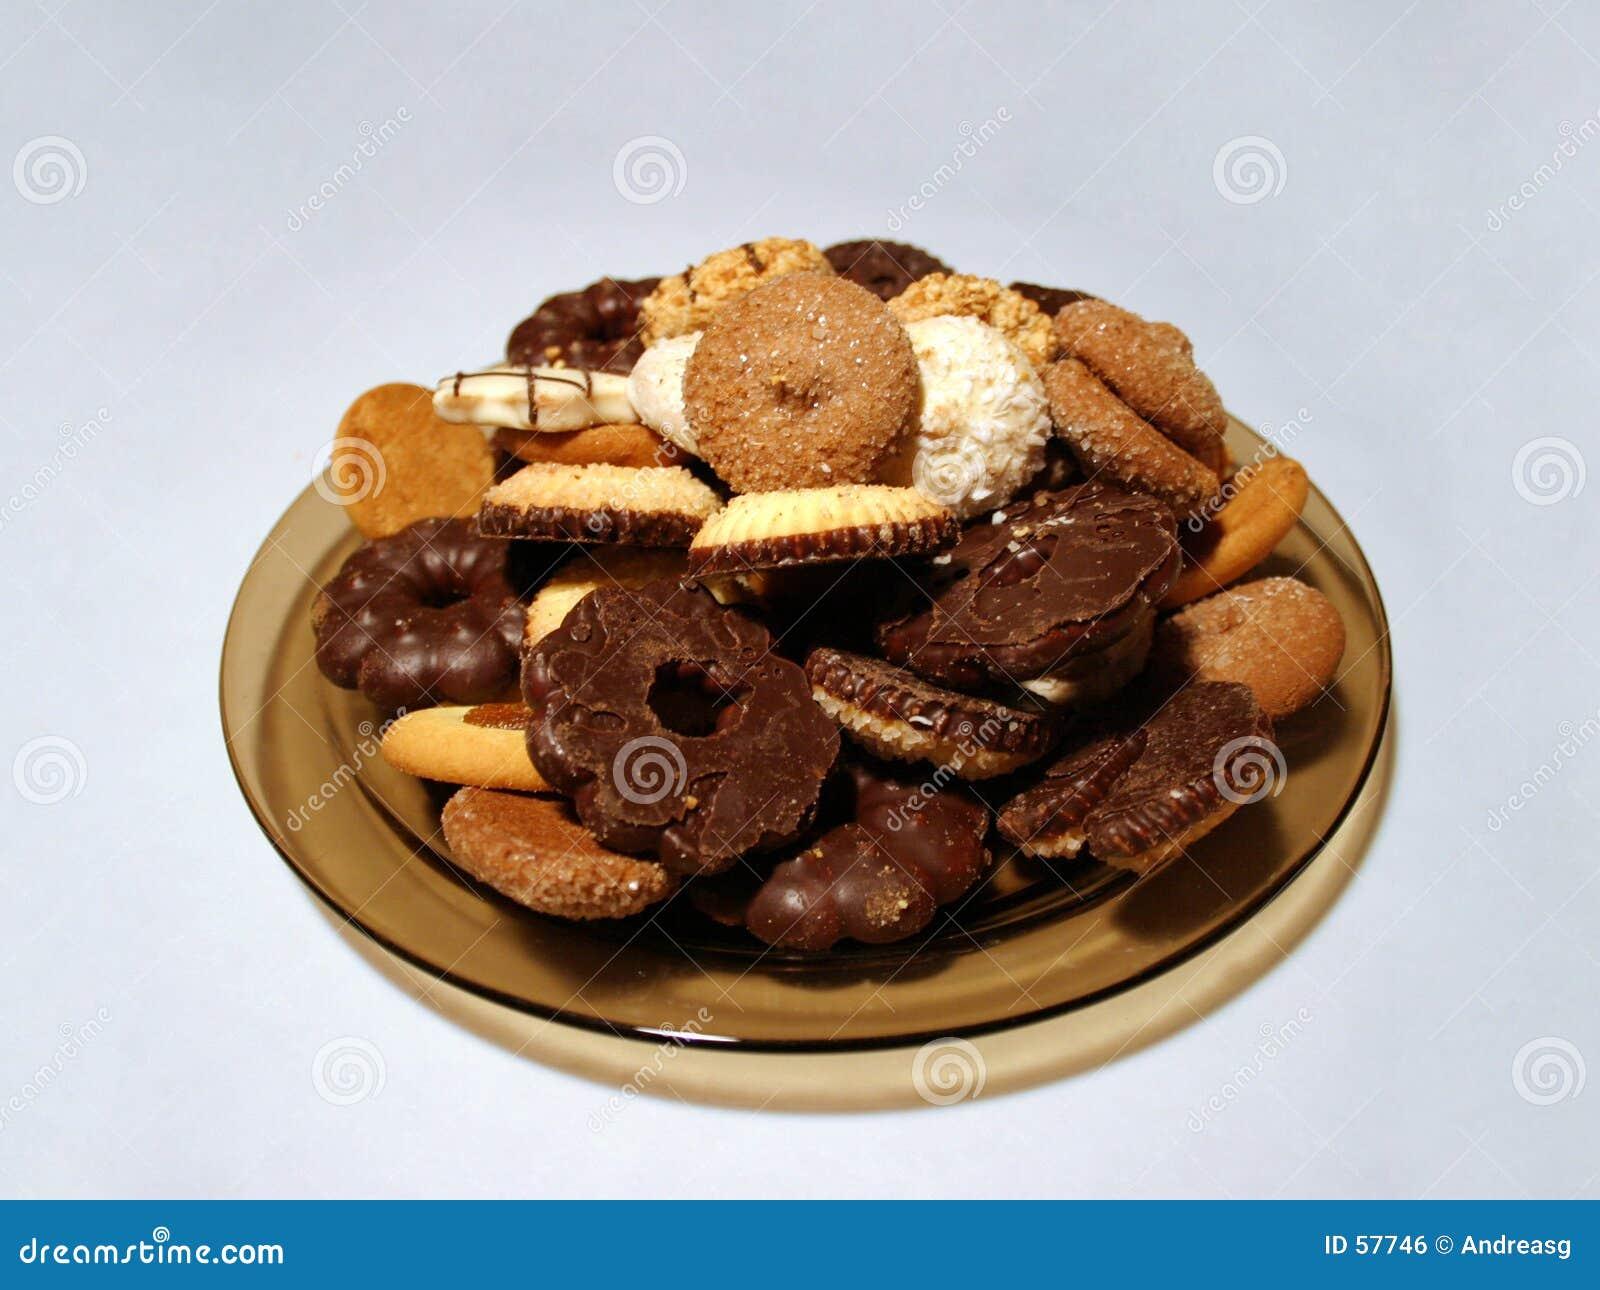 Download 2 μπισκότα στοκ εικόνες. εικόνα από balaclava, τρόφιμα, γλυκά - 57746